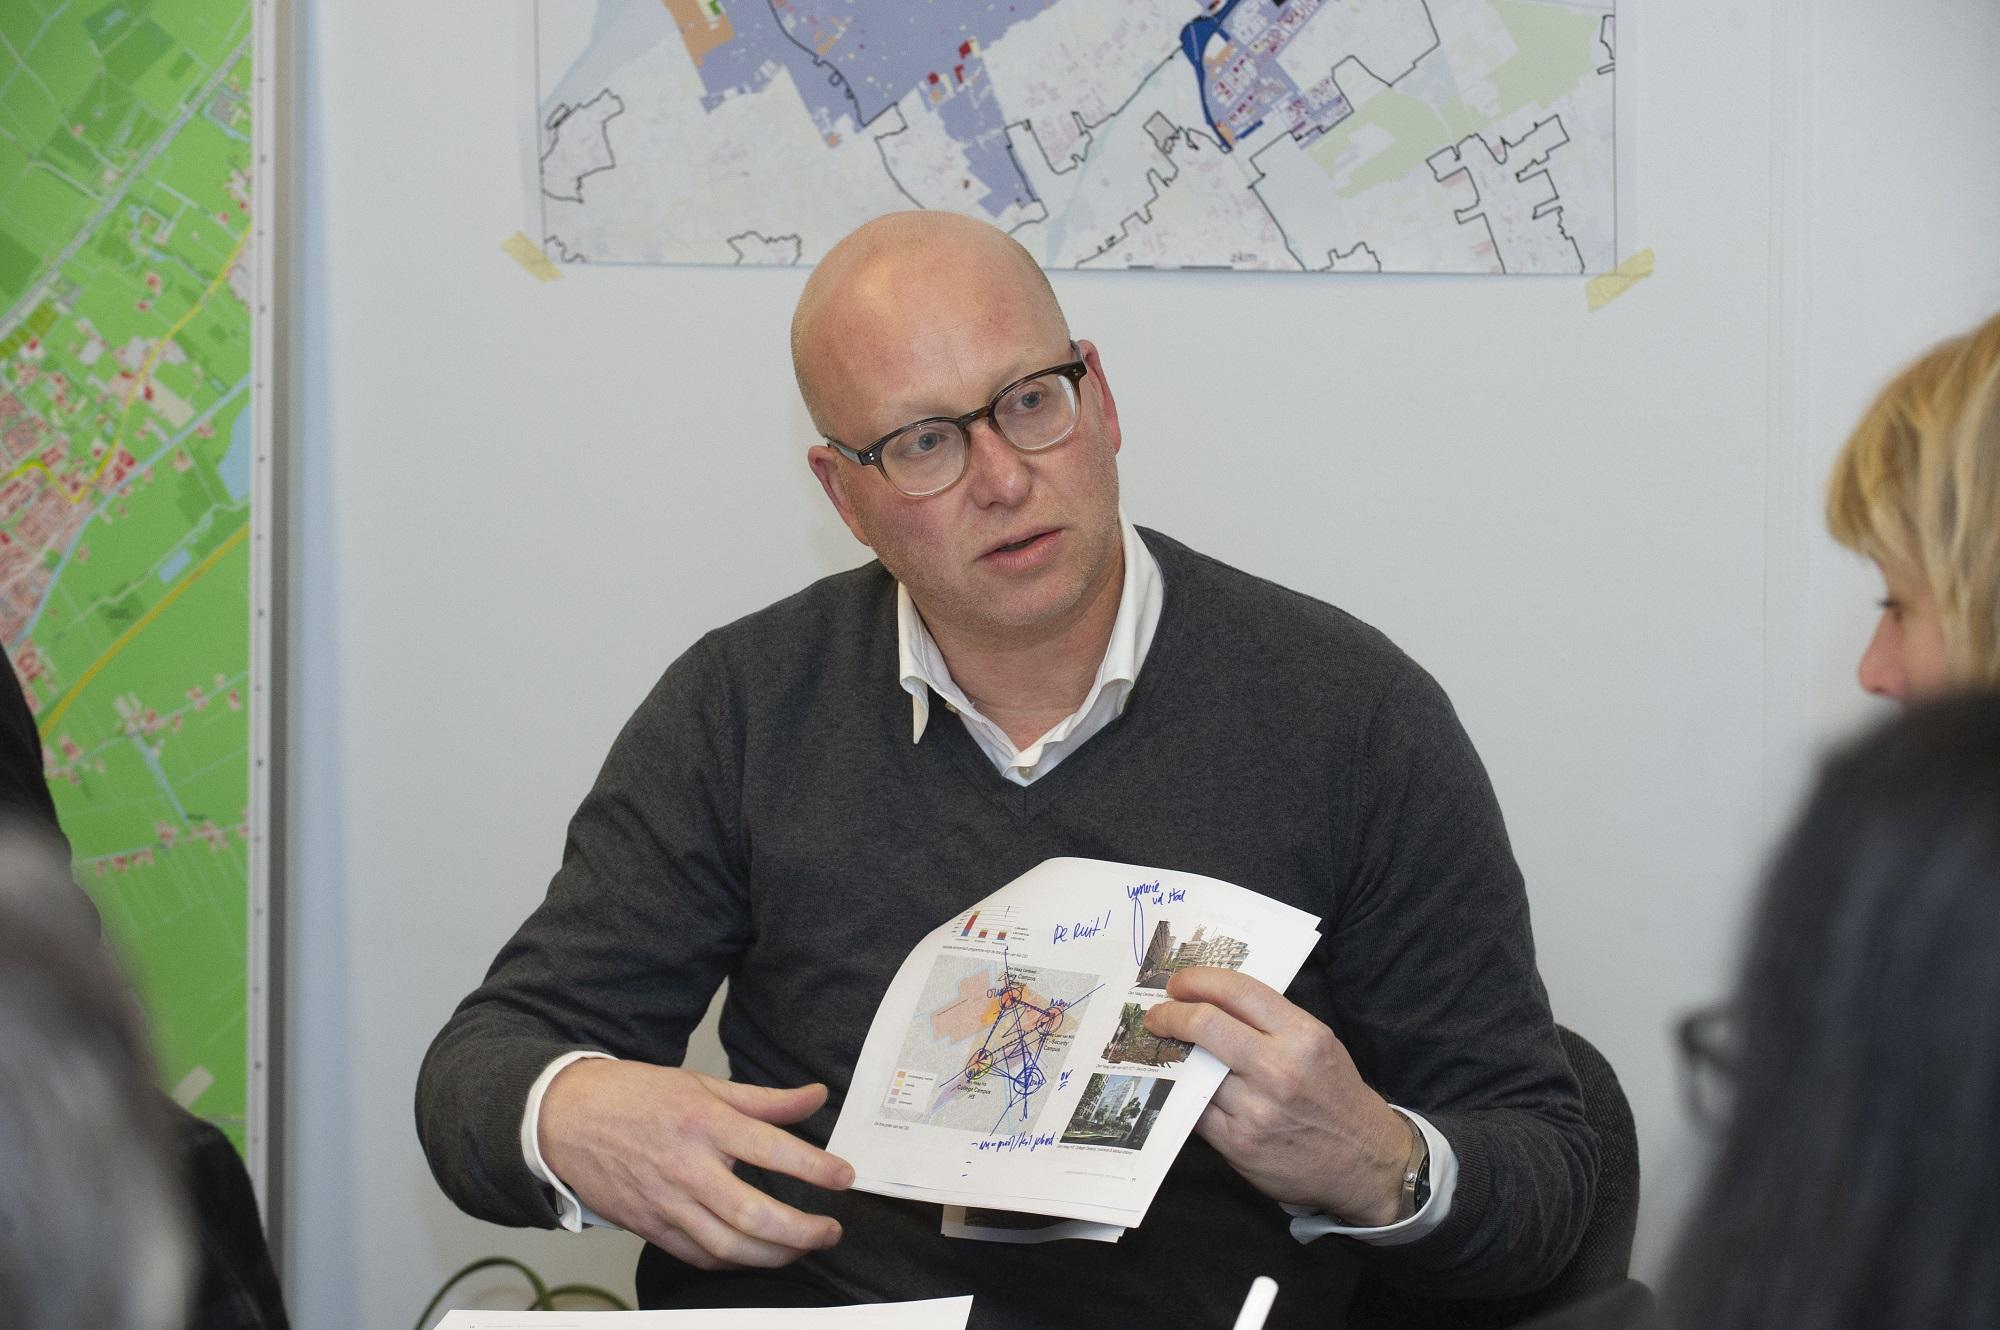 tekening koppelen CID en Binckhorst